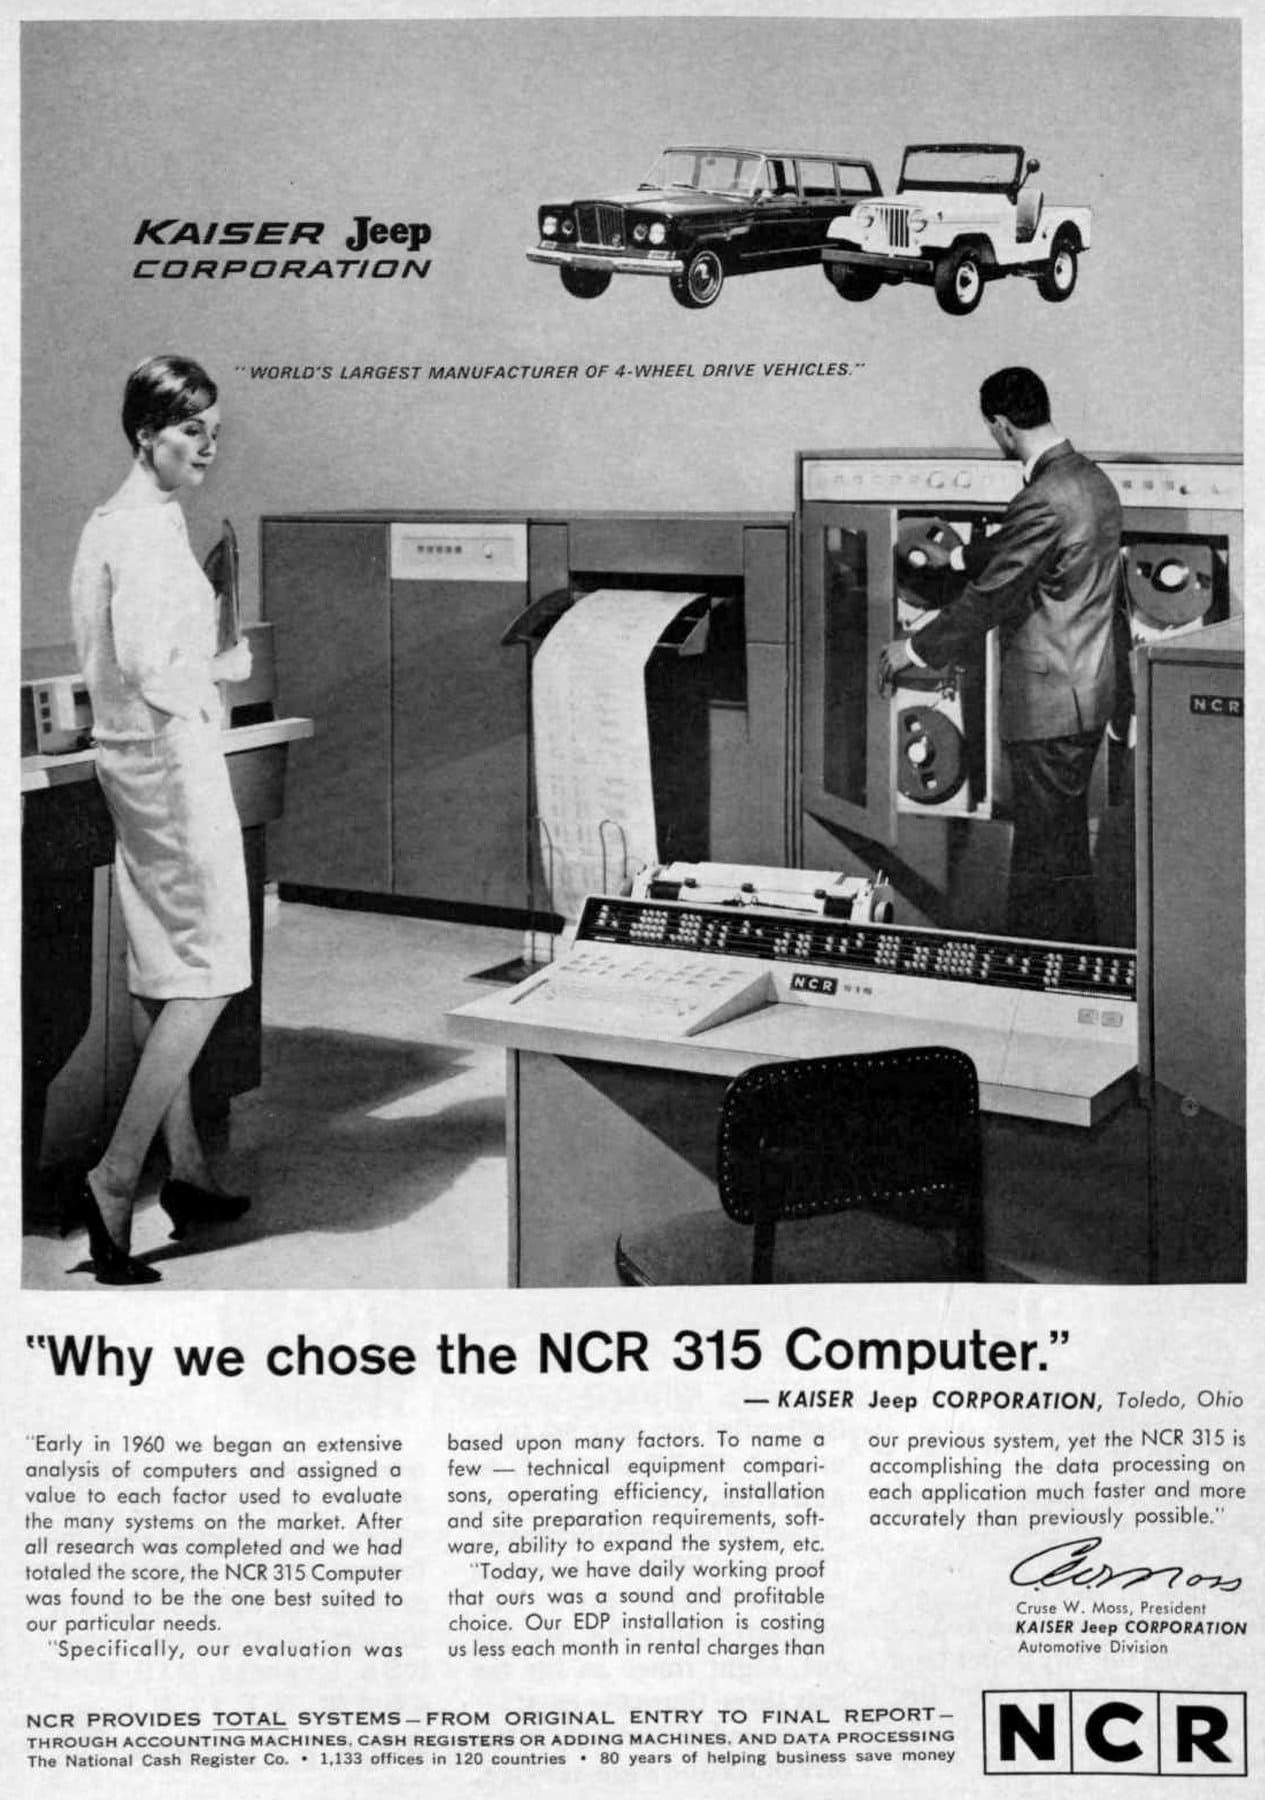 Kaiser-Jeep Corp - NCR 315 Computer (1964)